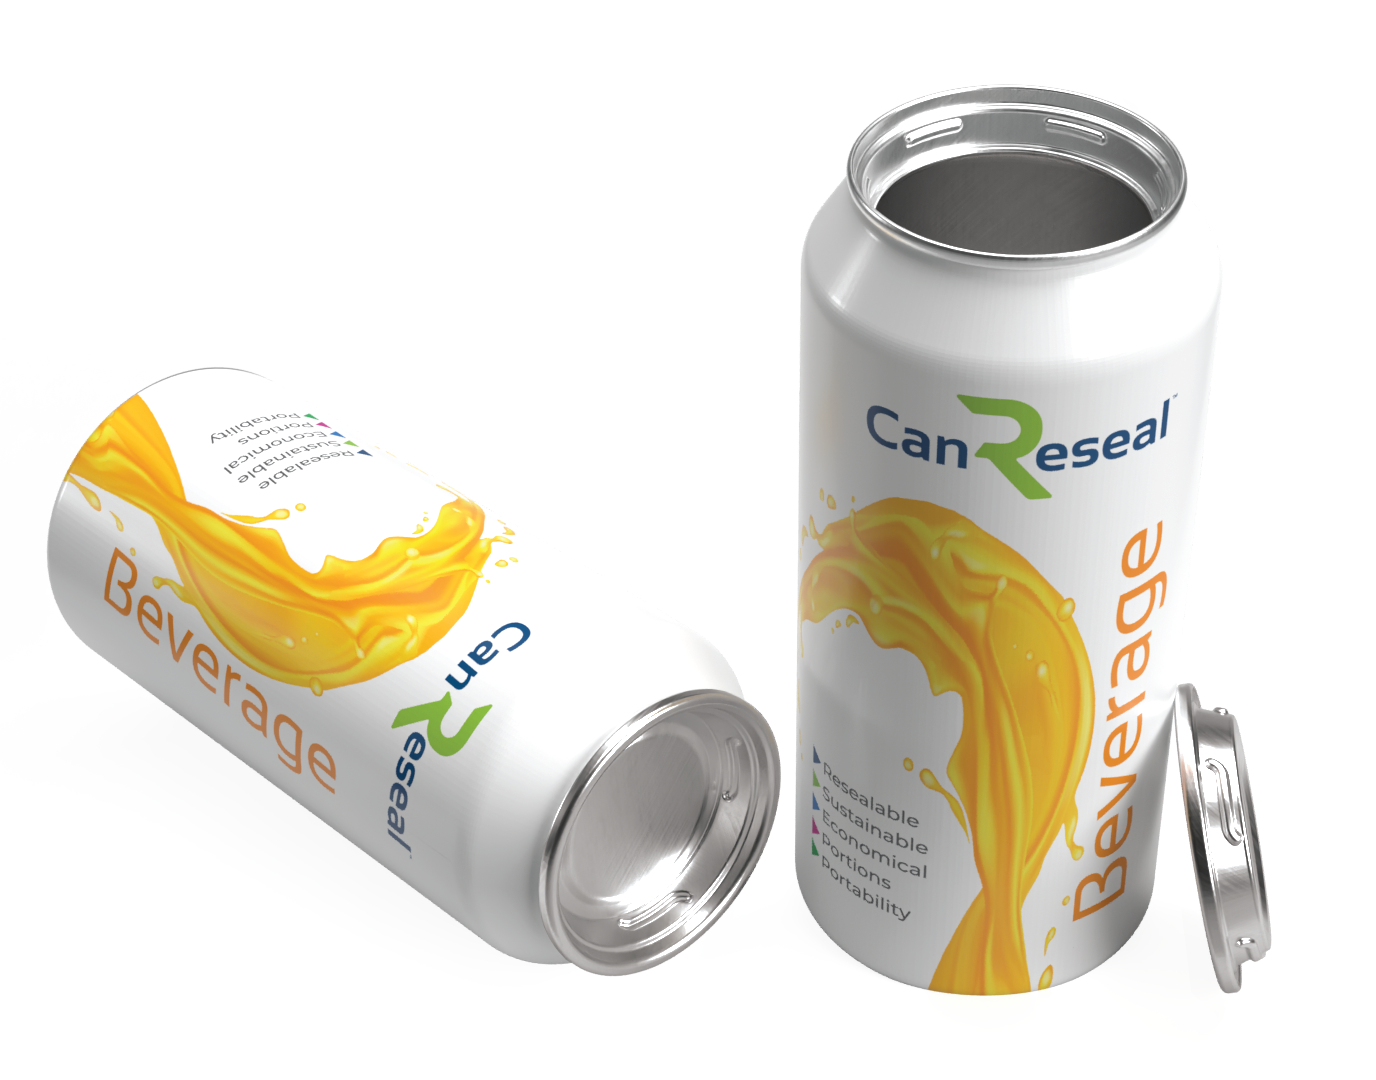 Beverage orange-canreaseal-configurations-solutions-page copy